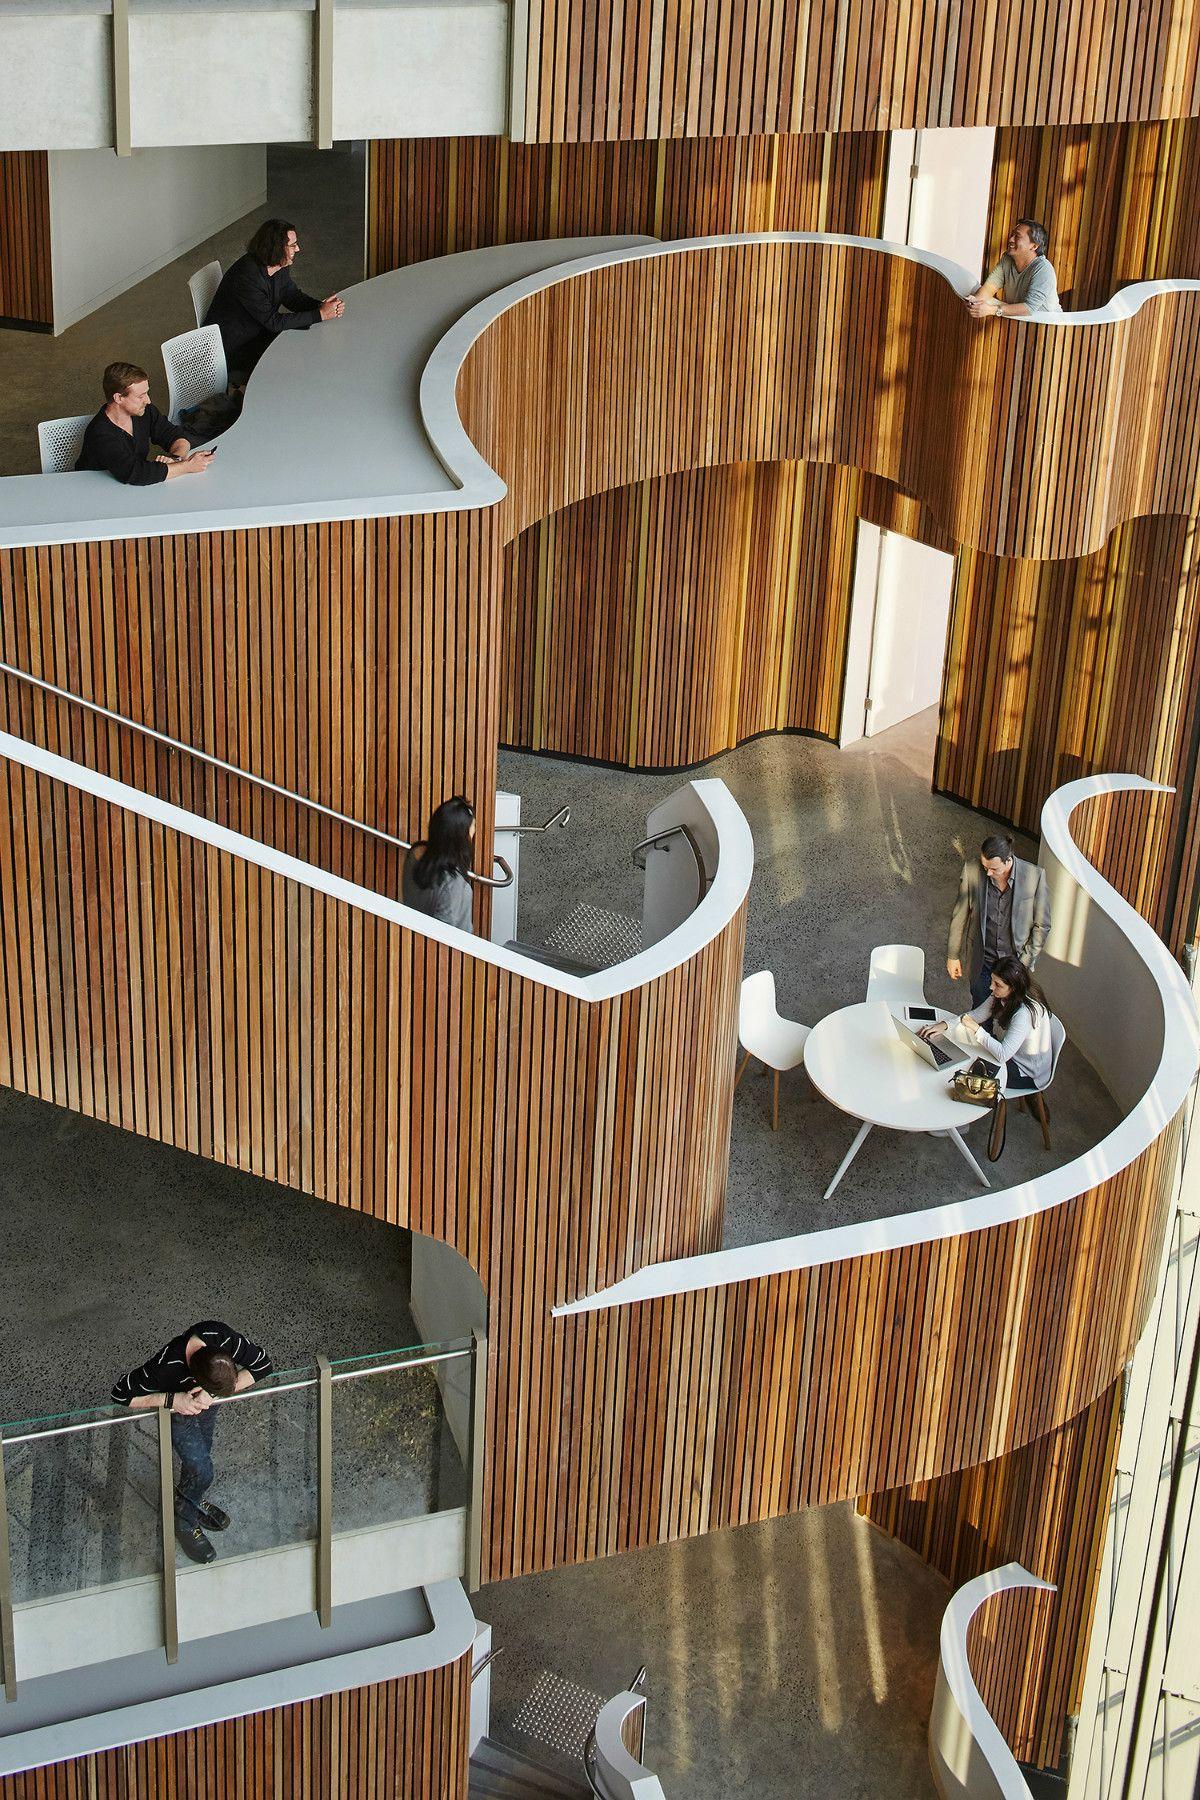 cool Novartis Australia HQ Campus | HDR Architecture Check more at http://www.arch2o.com/novartis-australia-hq-campus-hdr-architecture/